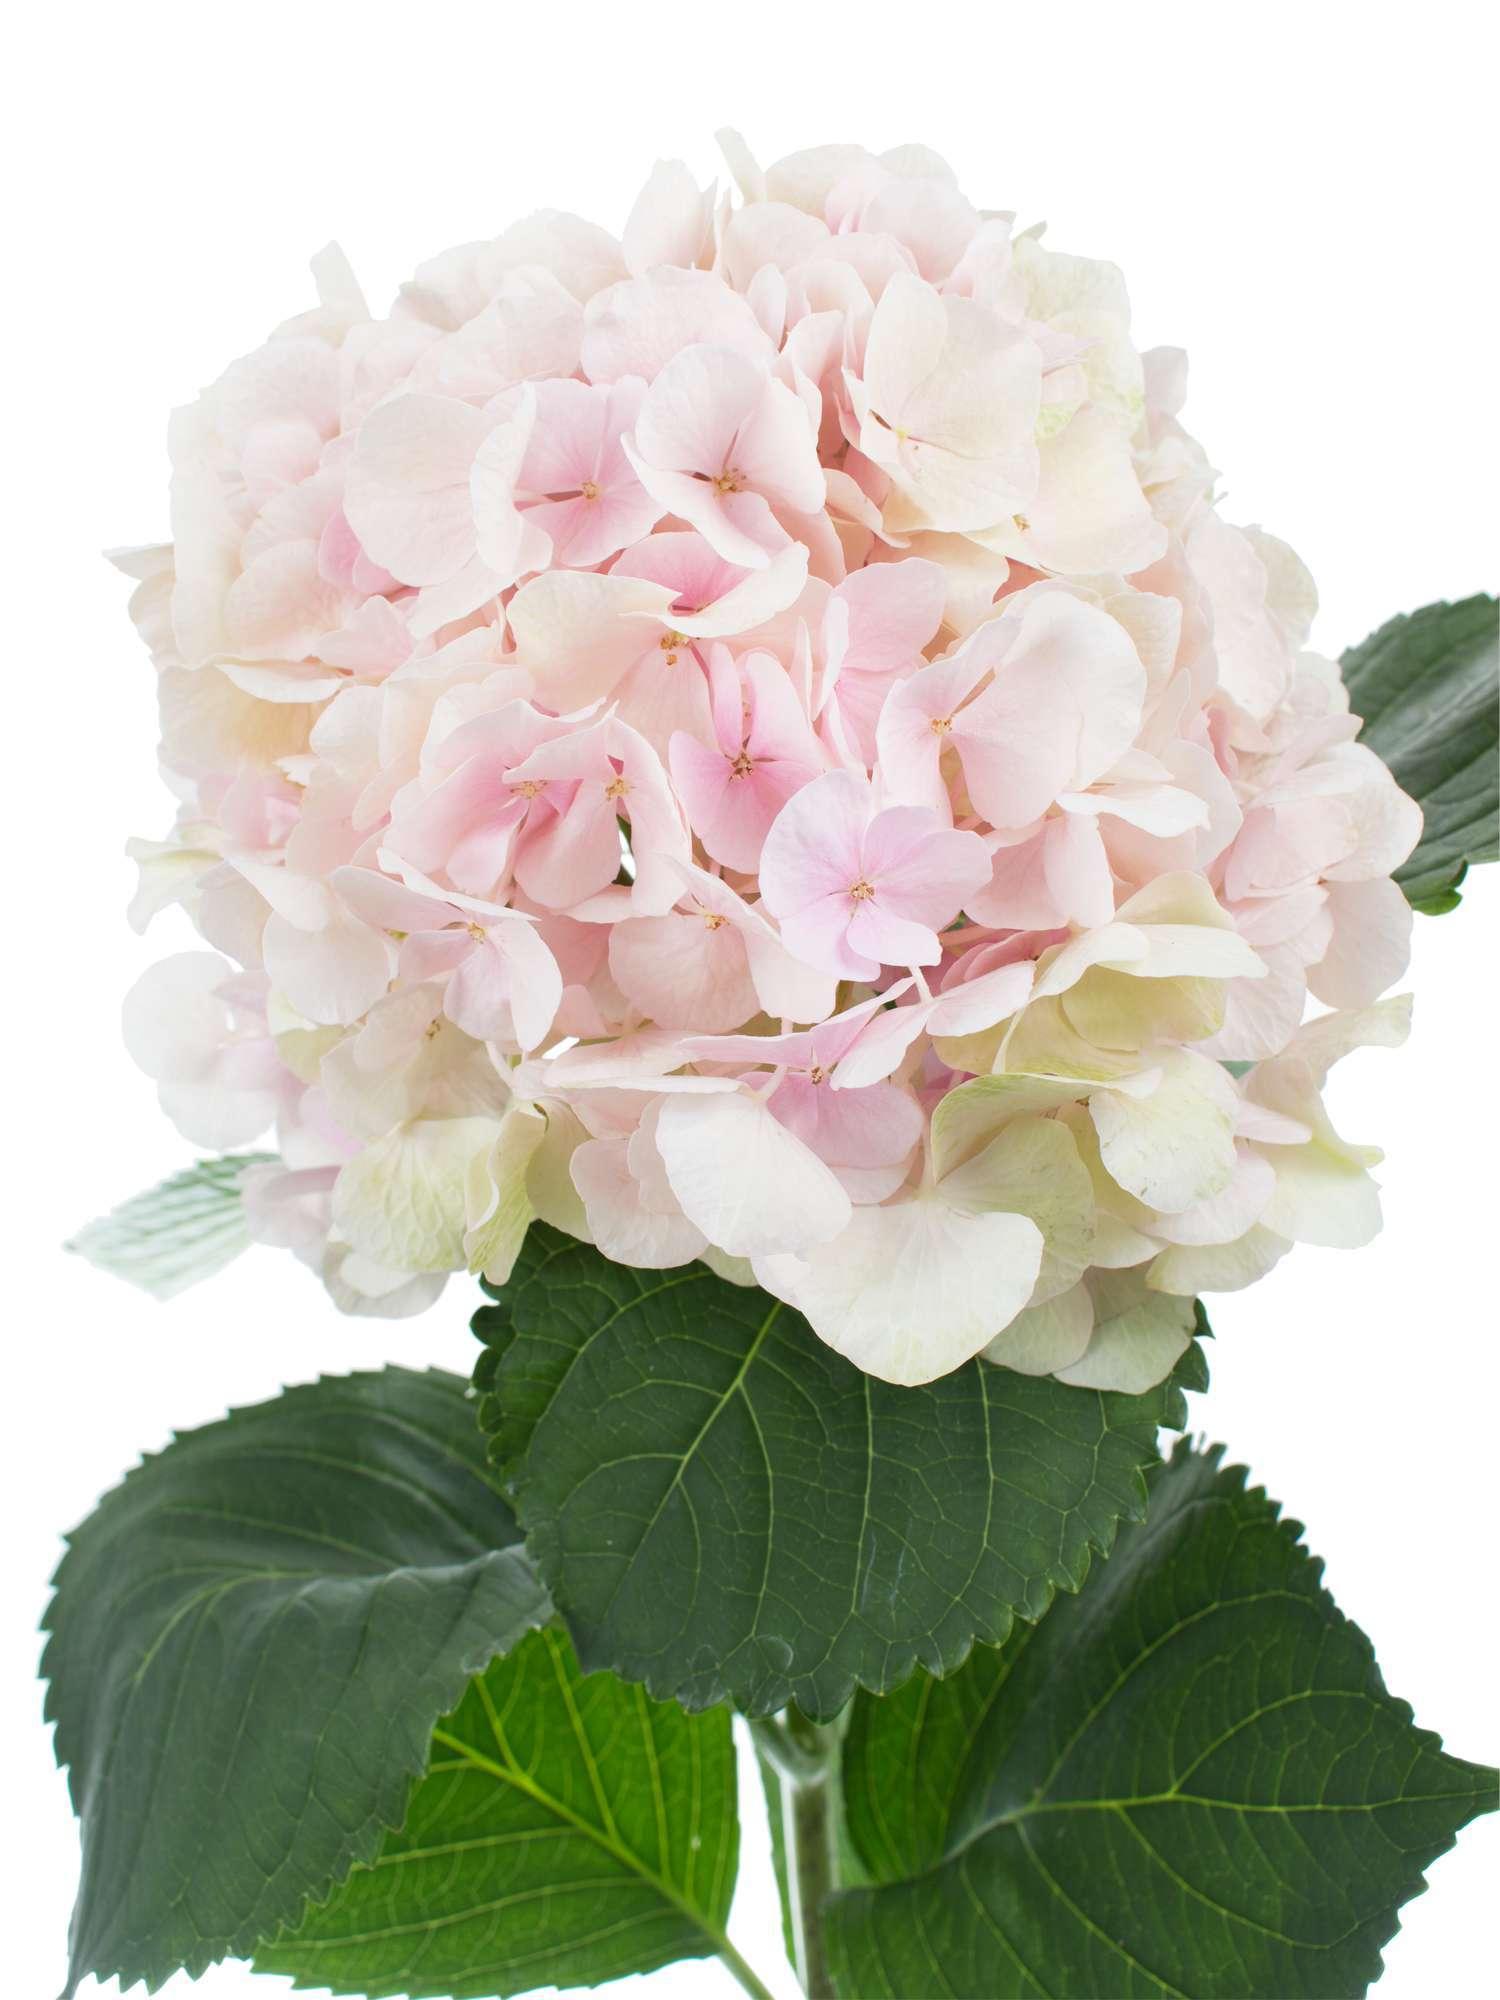 hortensie magical verena classic rosa gr n bestellen. Black Bedroom Furniture Sets. Home Design Ideas